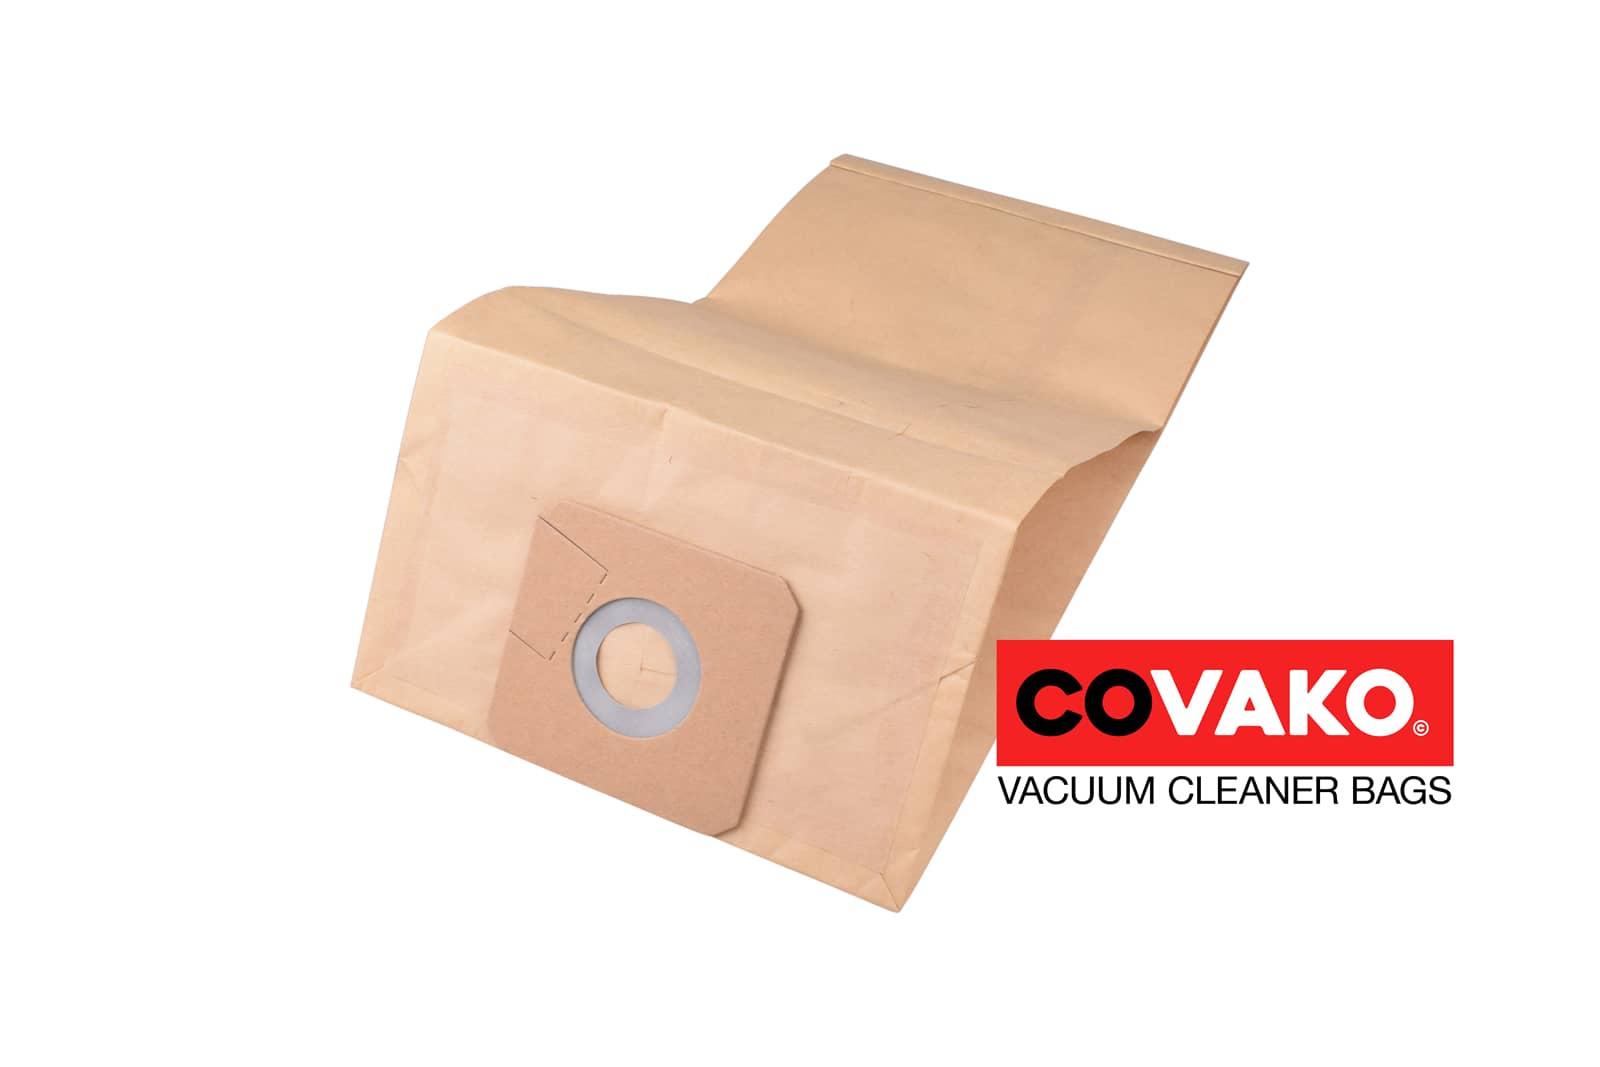 Kärcher T 12/1 / Paper - Kärcher vacuum cleaner bags